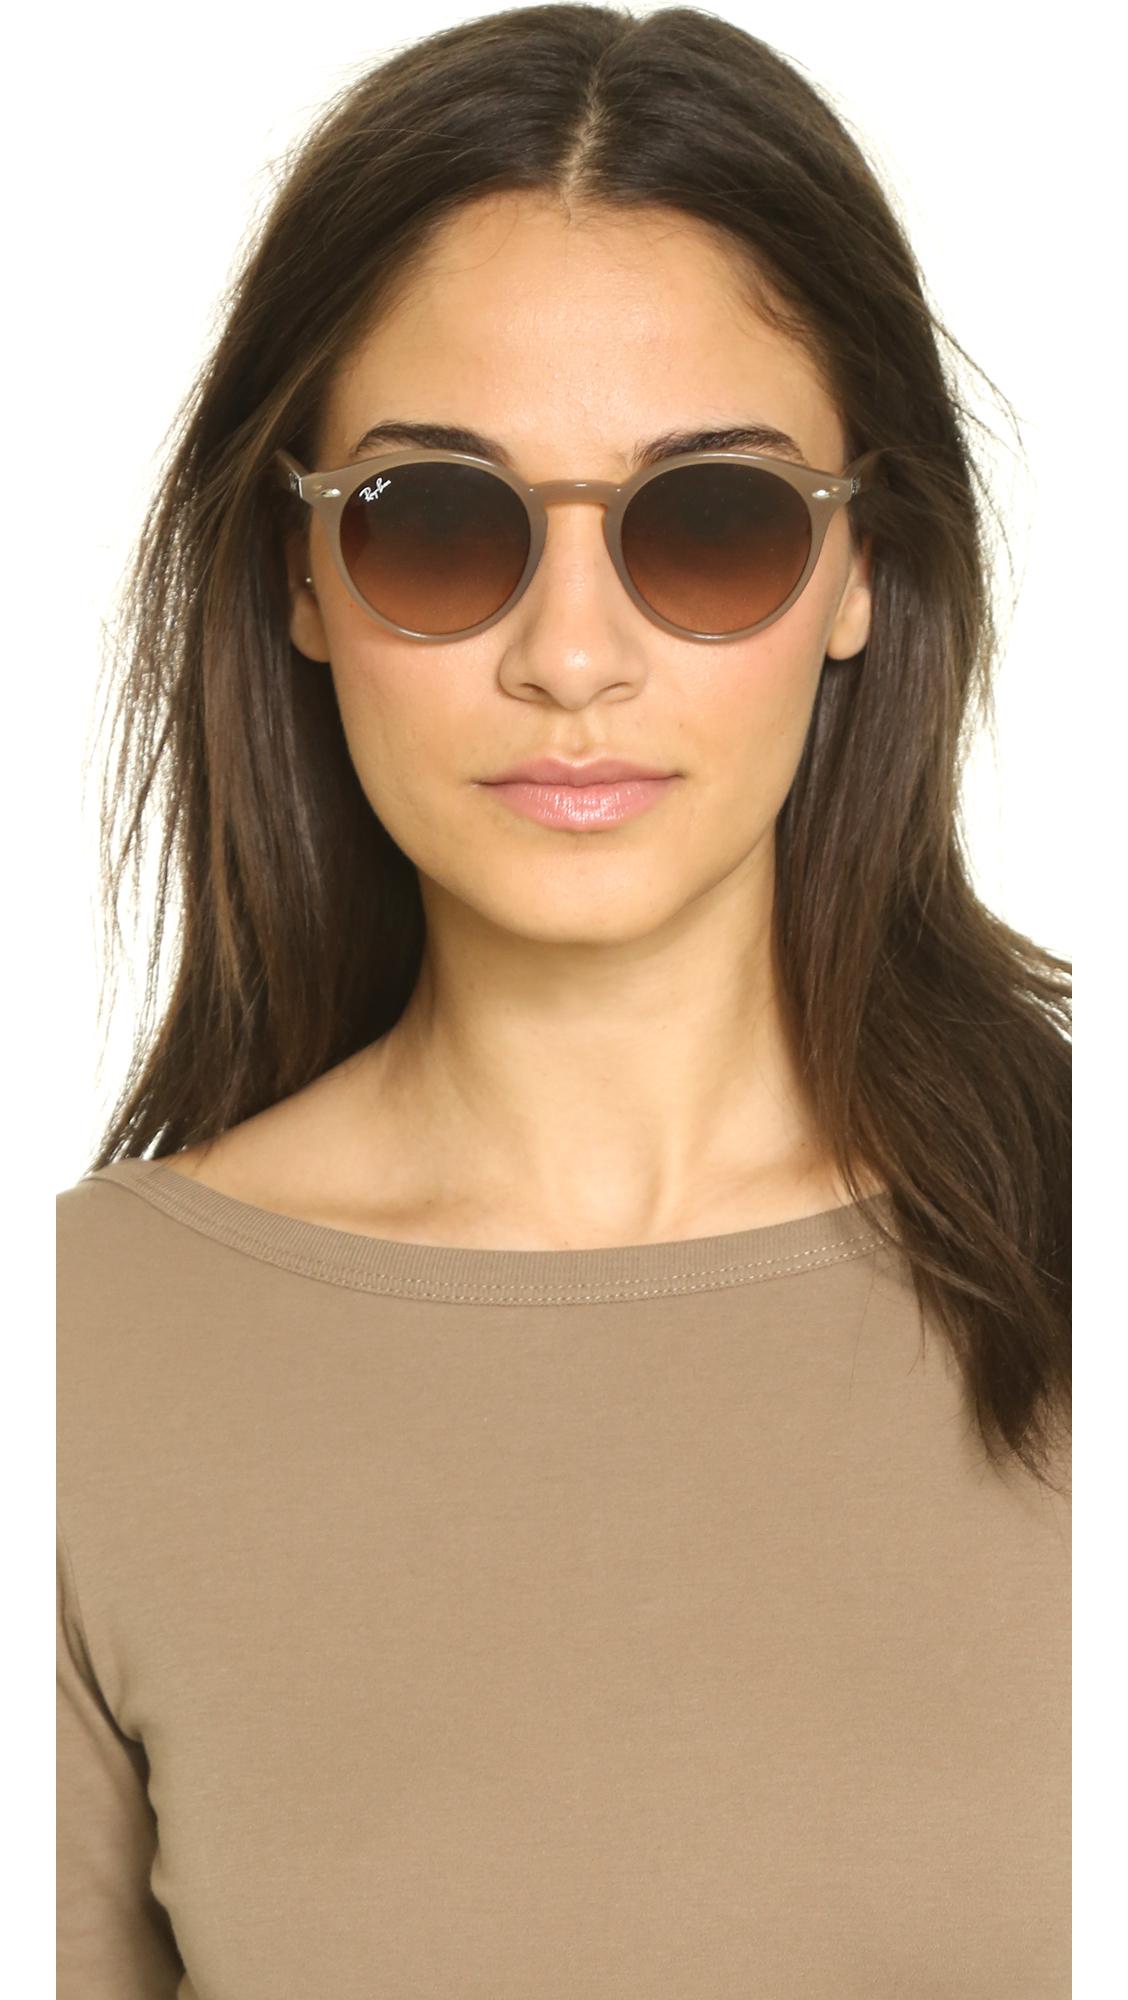 Ray Ban Highstreet Round Sunglasses Green Grey Gradient